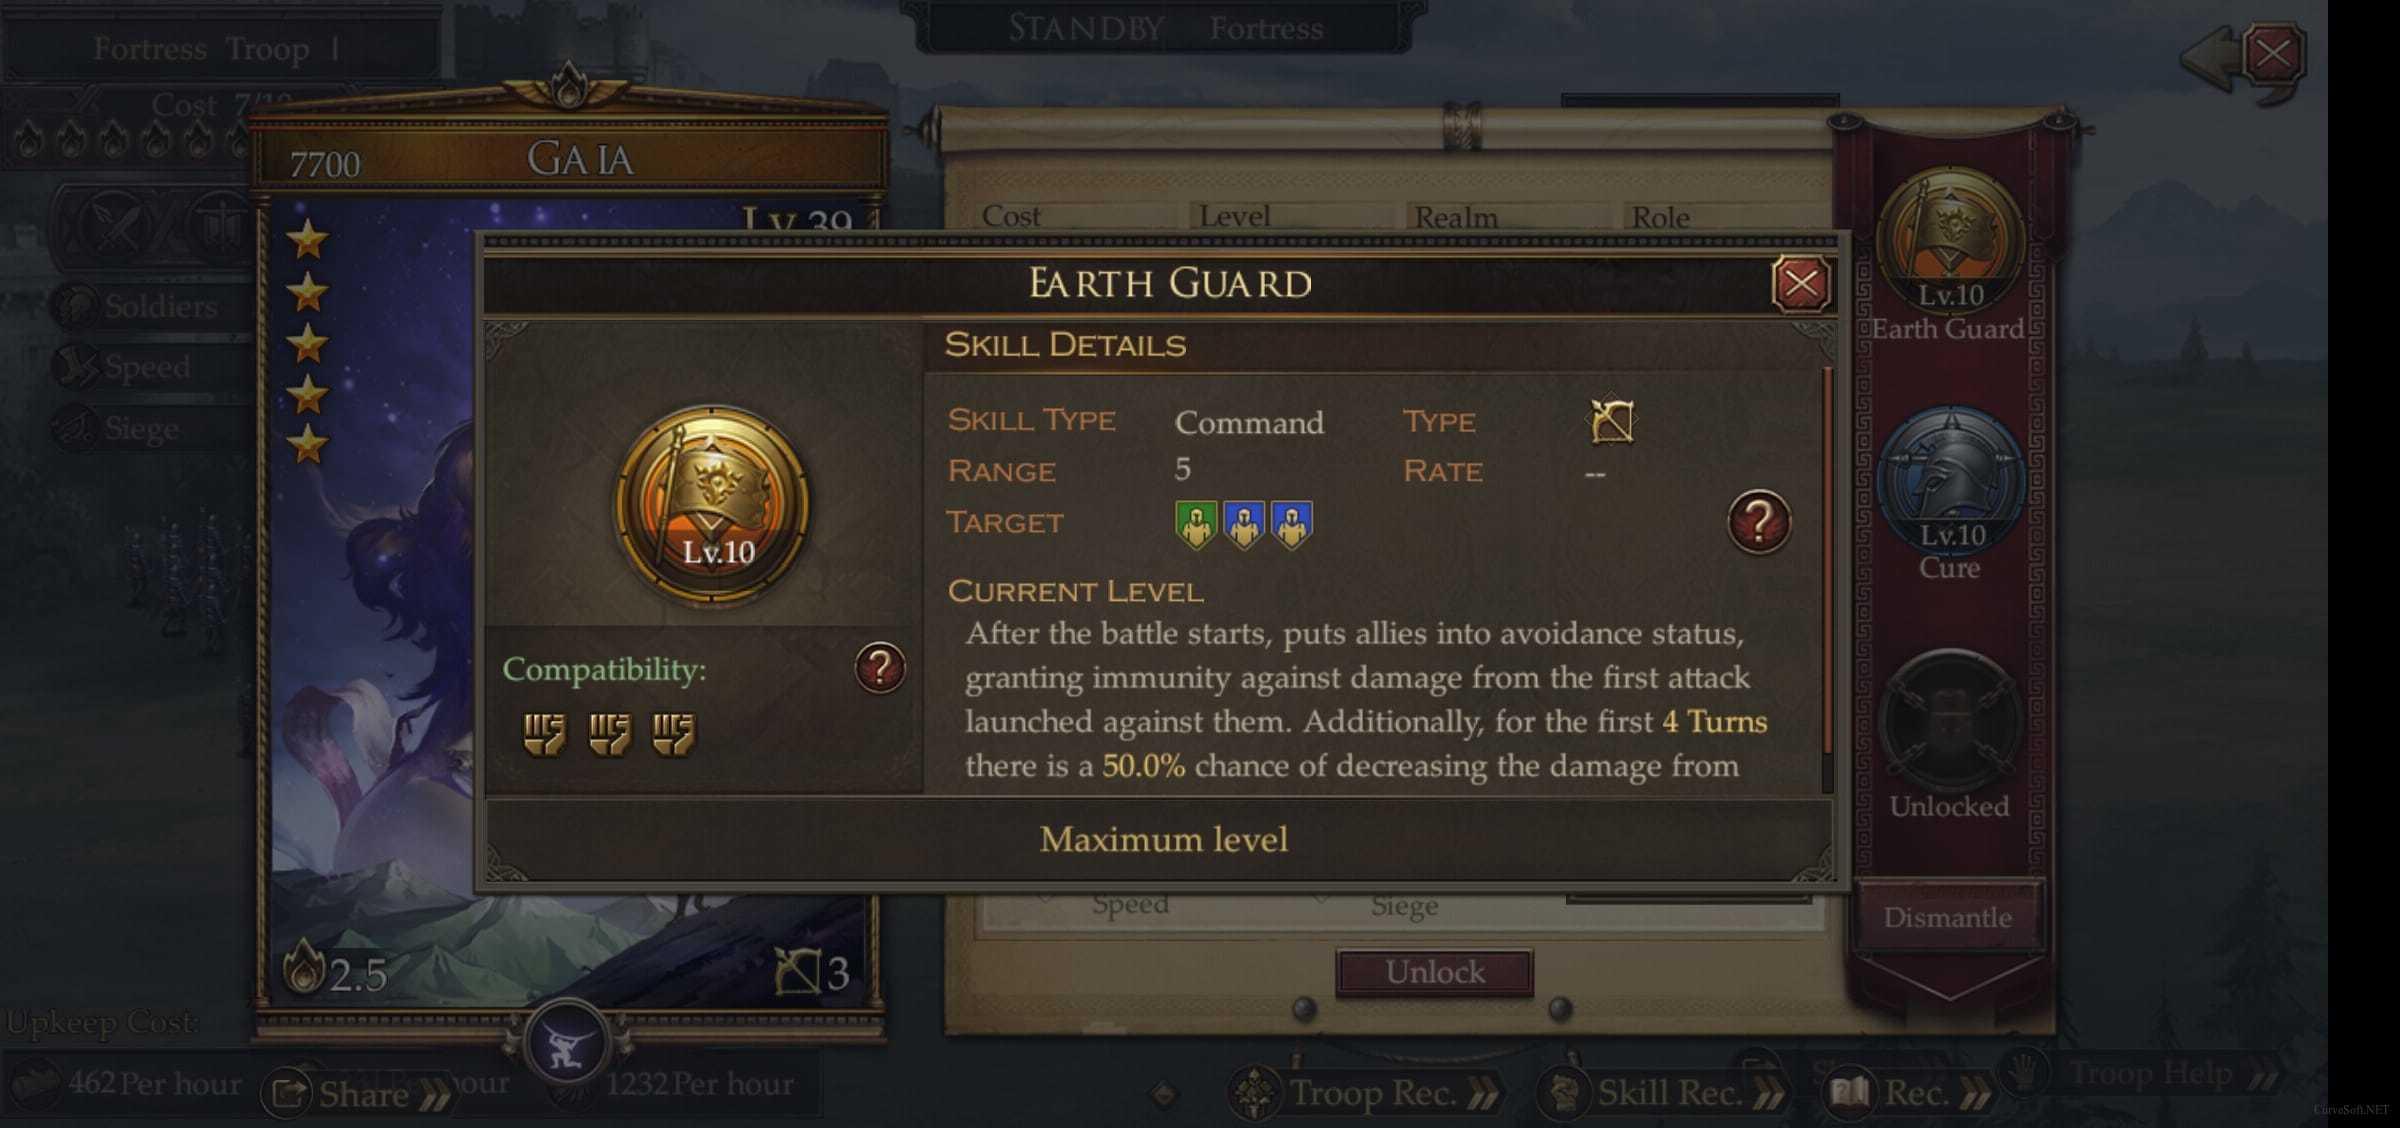 Earth Guard